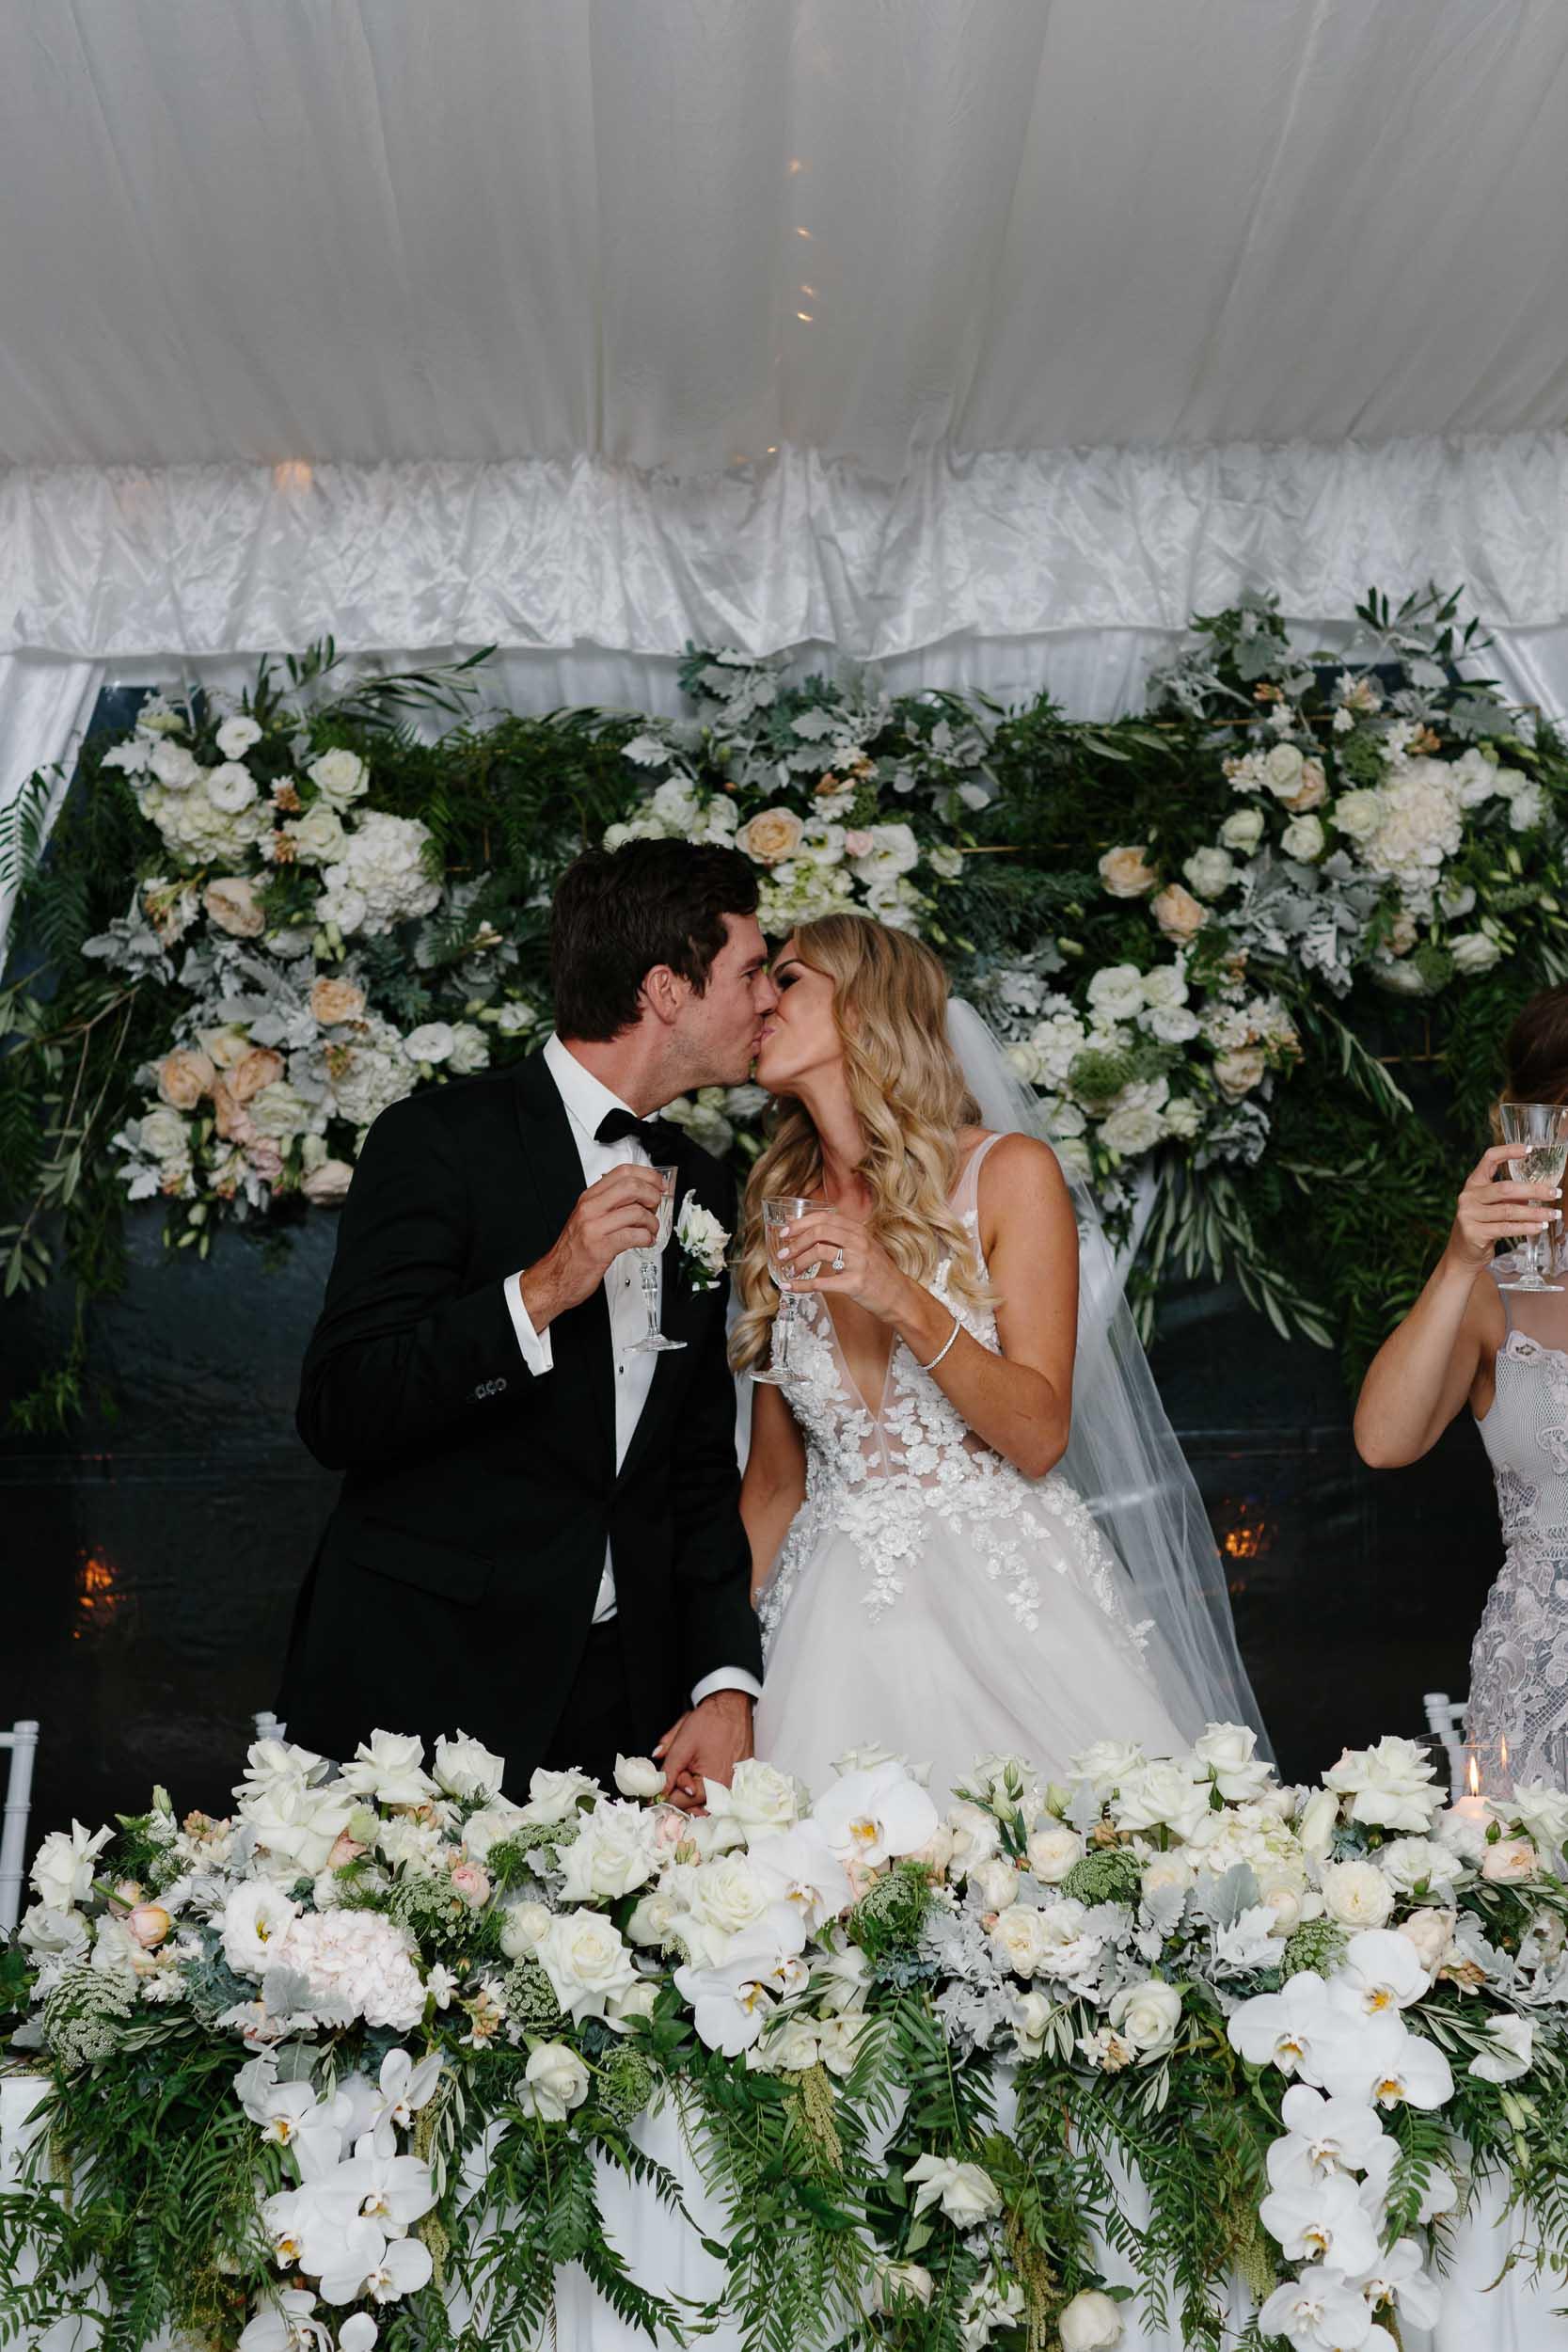 Kas-Richards-Mornington-Peninsula-Private-Property-Wedding-Marianna-Hardwick-Gown-723.jpg